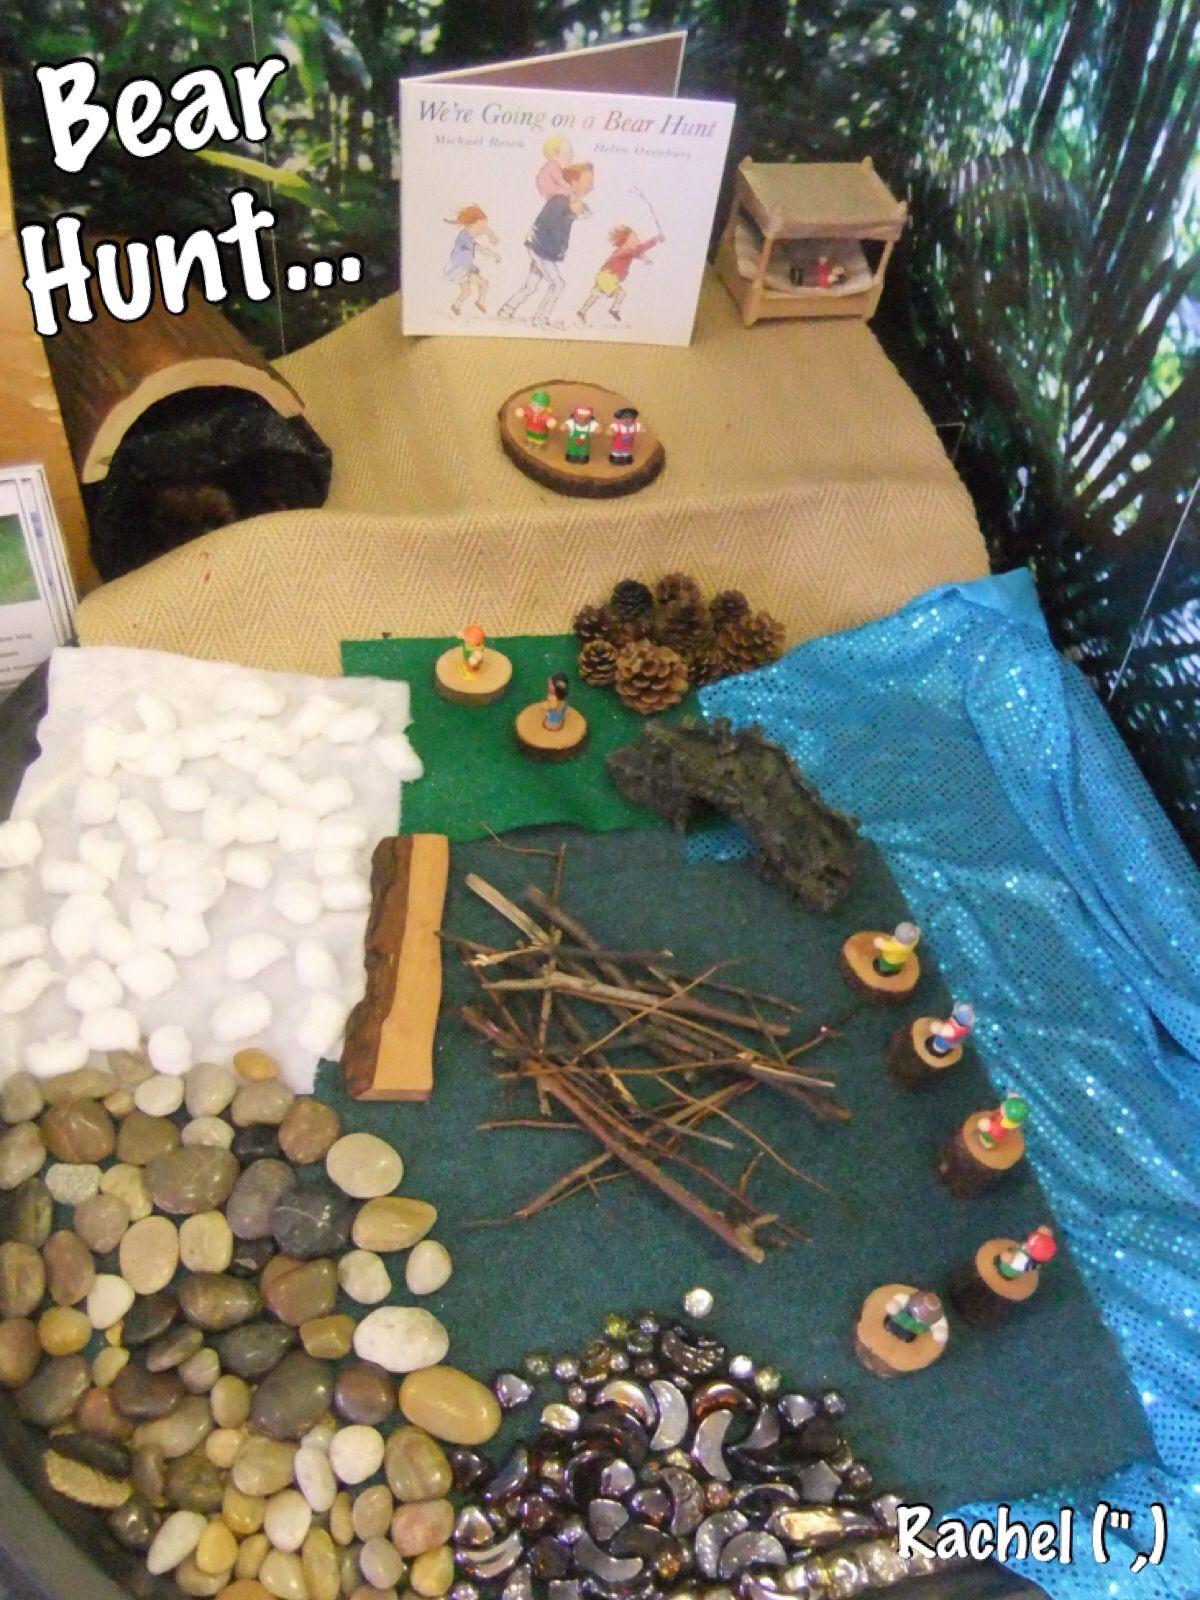 "We're Going on a Bear Hunt Small World by Rachel ("",) | Nursery ..."